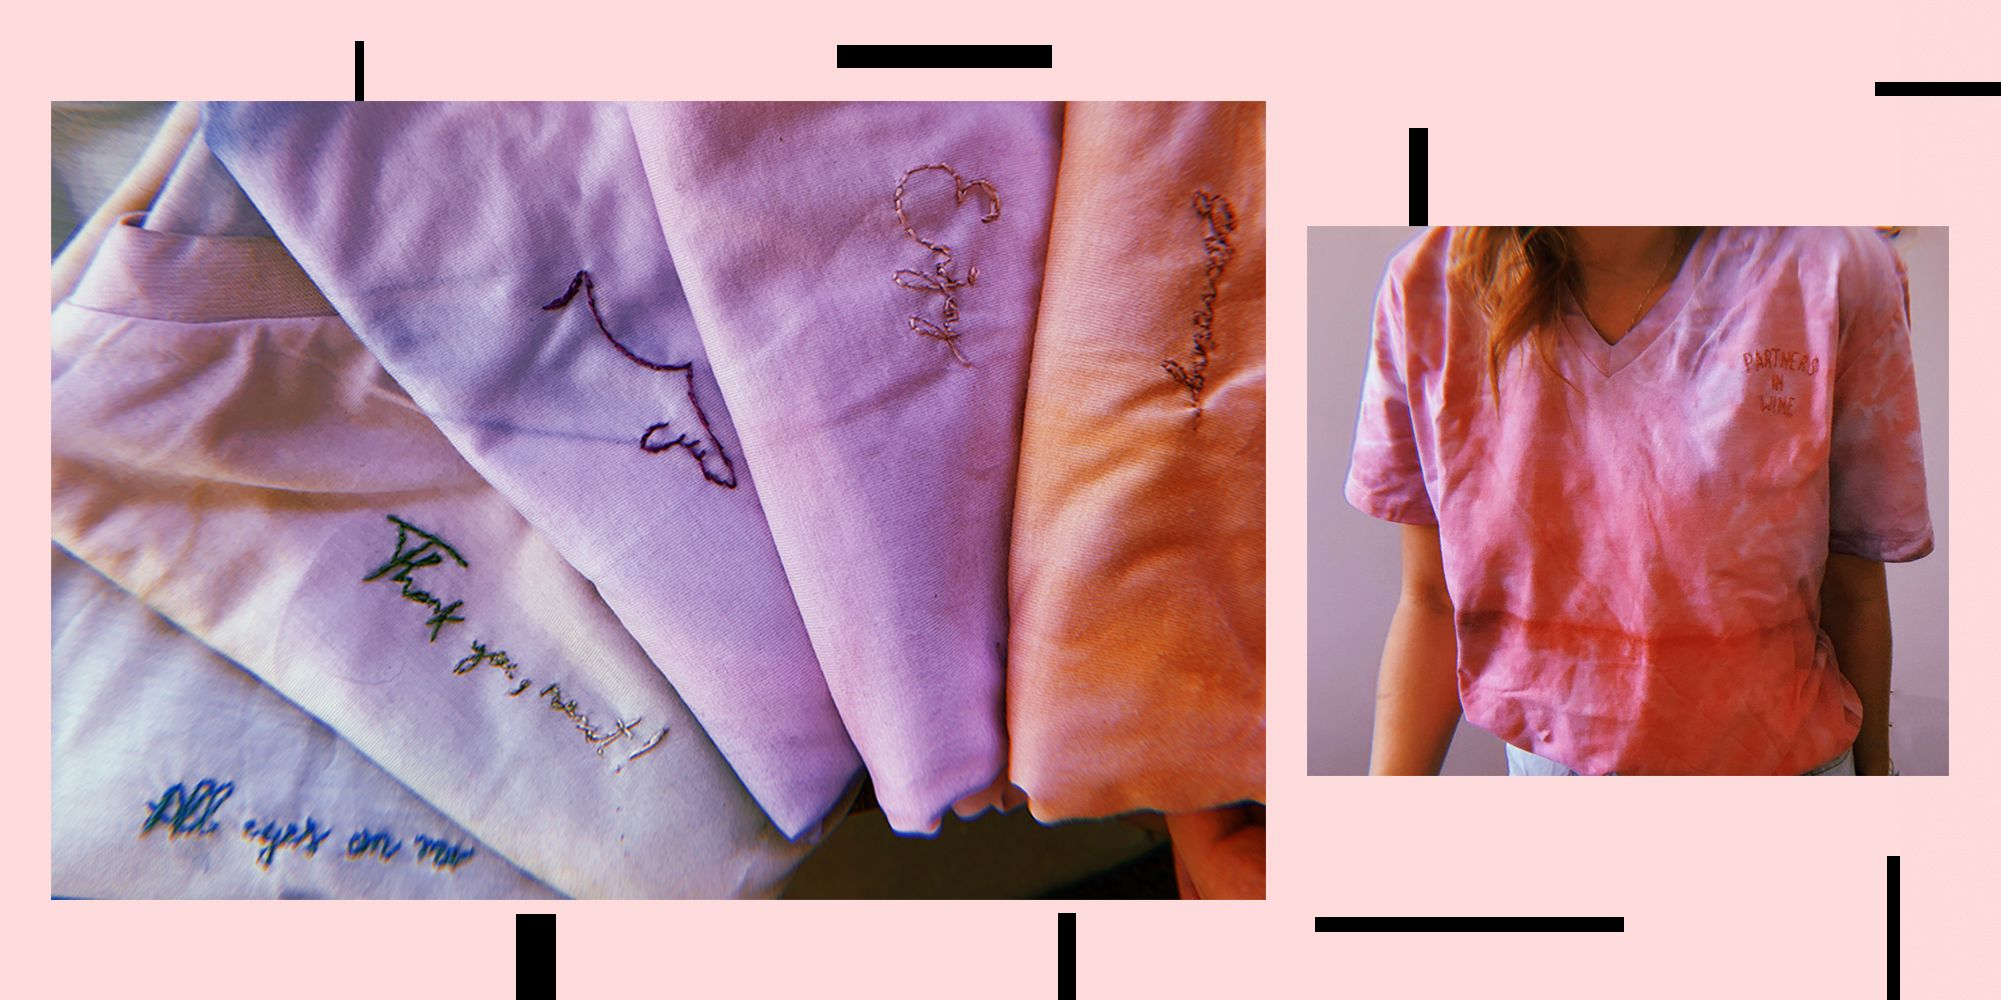 Camisetas #tiedye pintadas e bordadas manualmente, ✨ . #handmade #shoplocal #feitoamao #camiseta #bordado